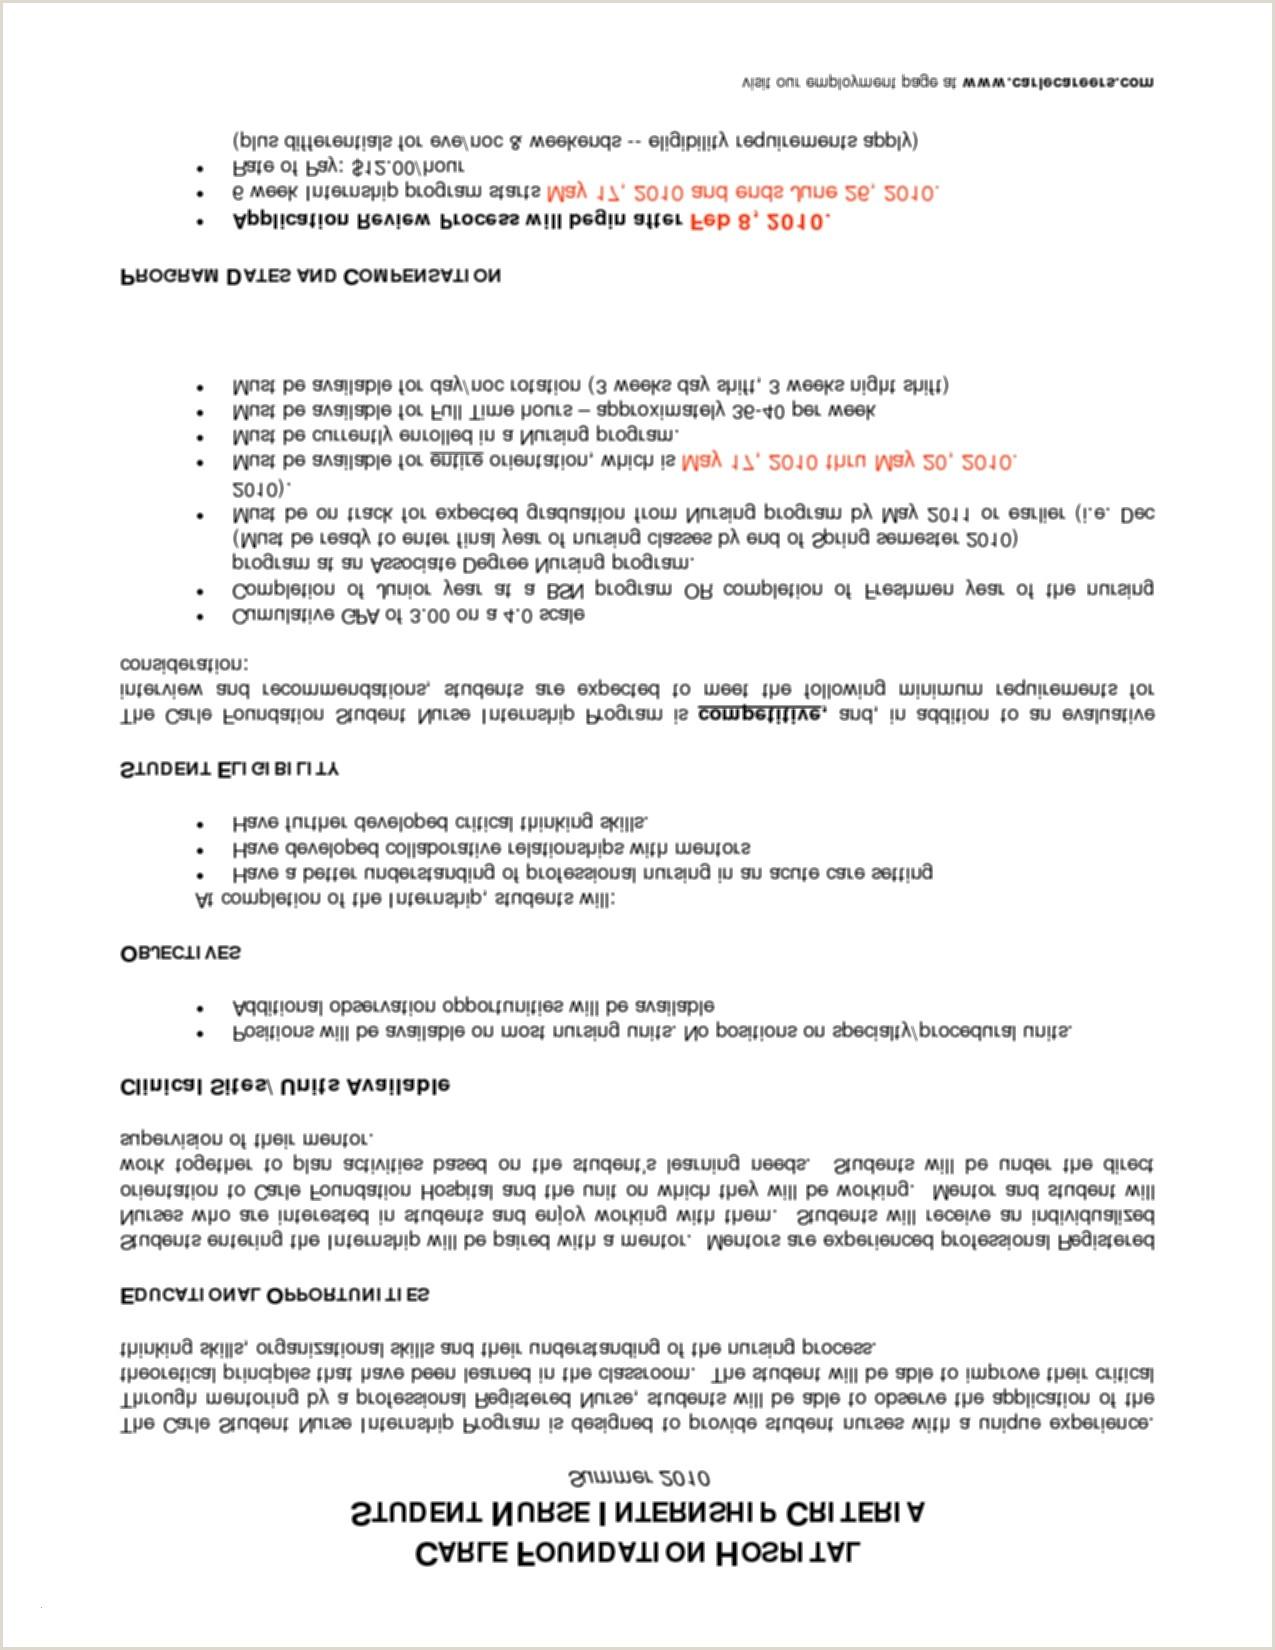 Fresher Resume Best format Us Resume format for Freshers Awesome Us Resume format for